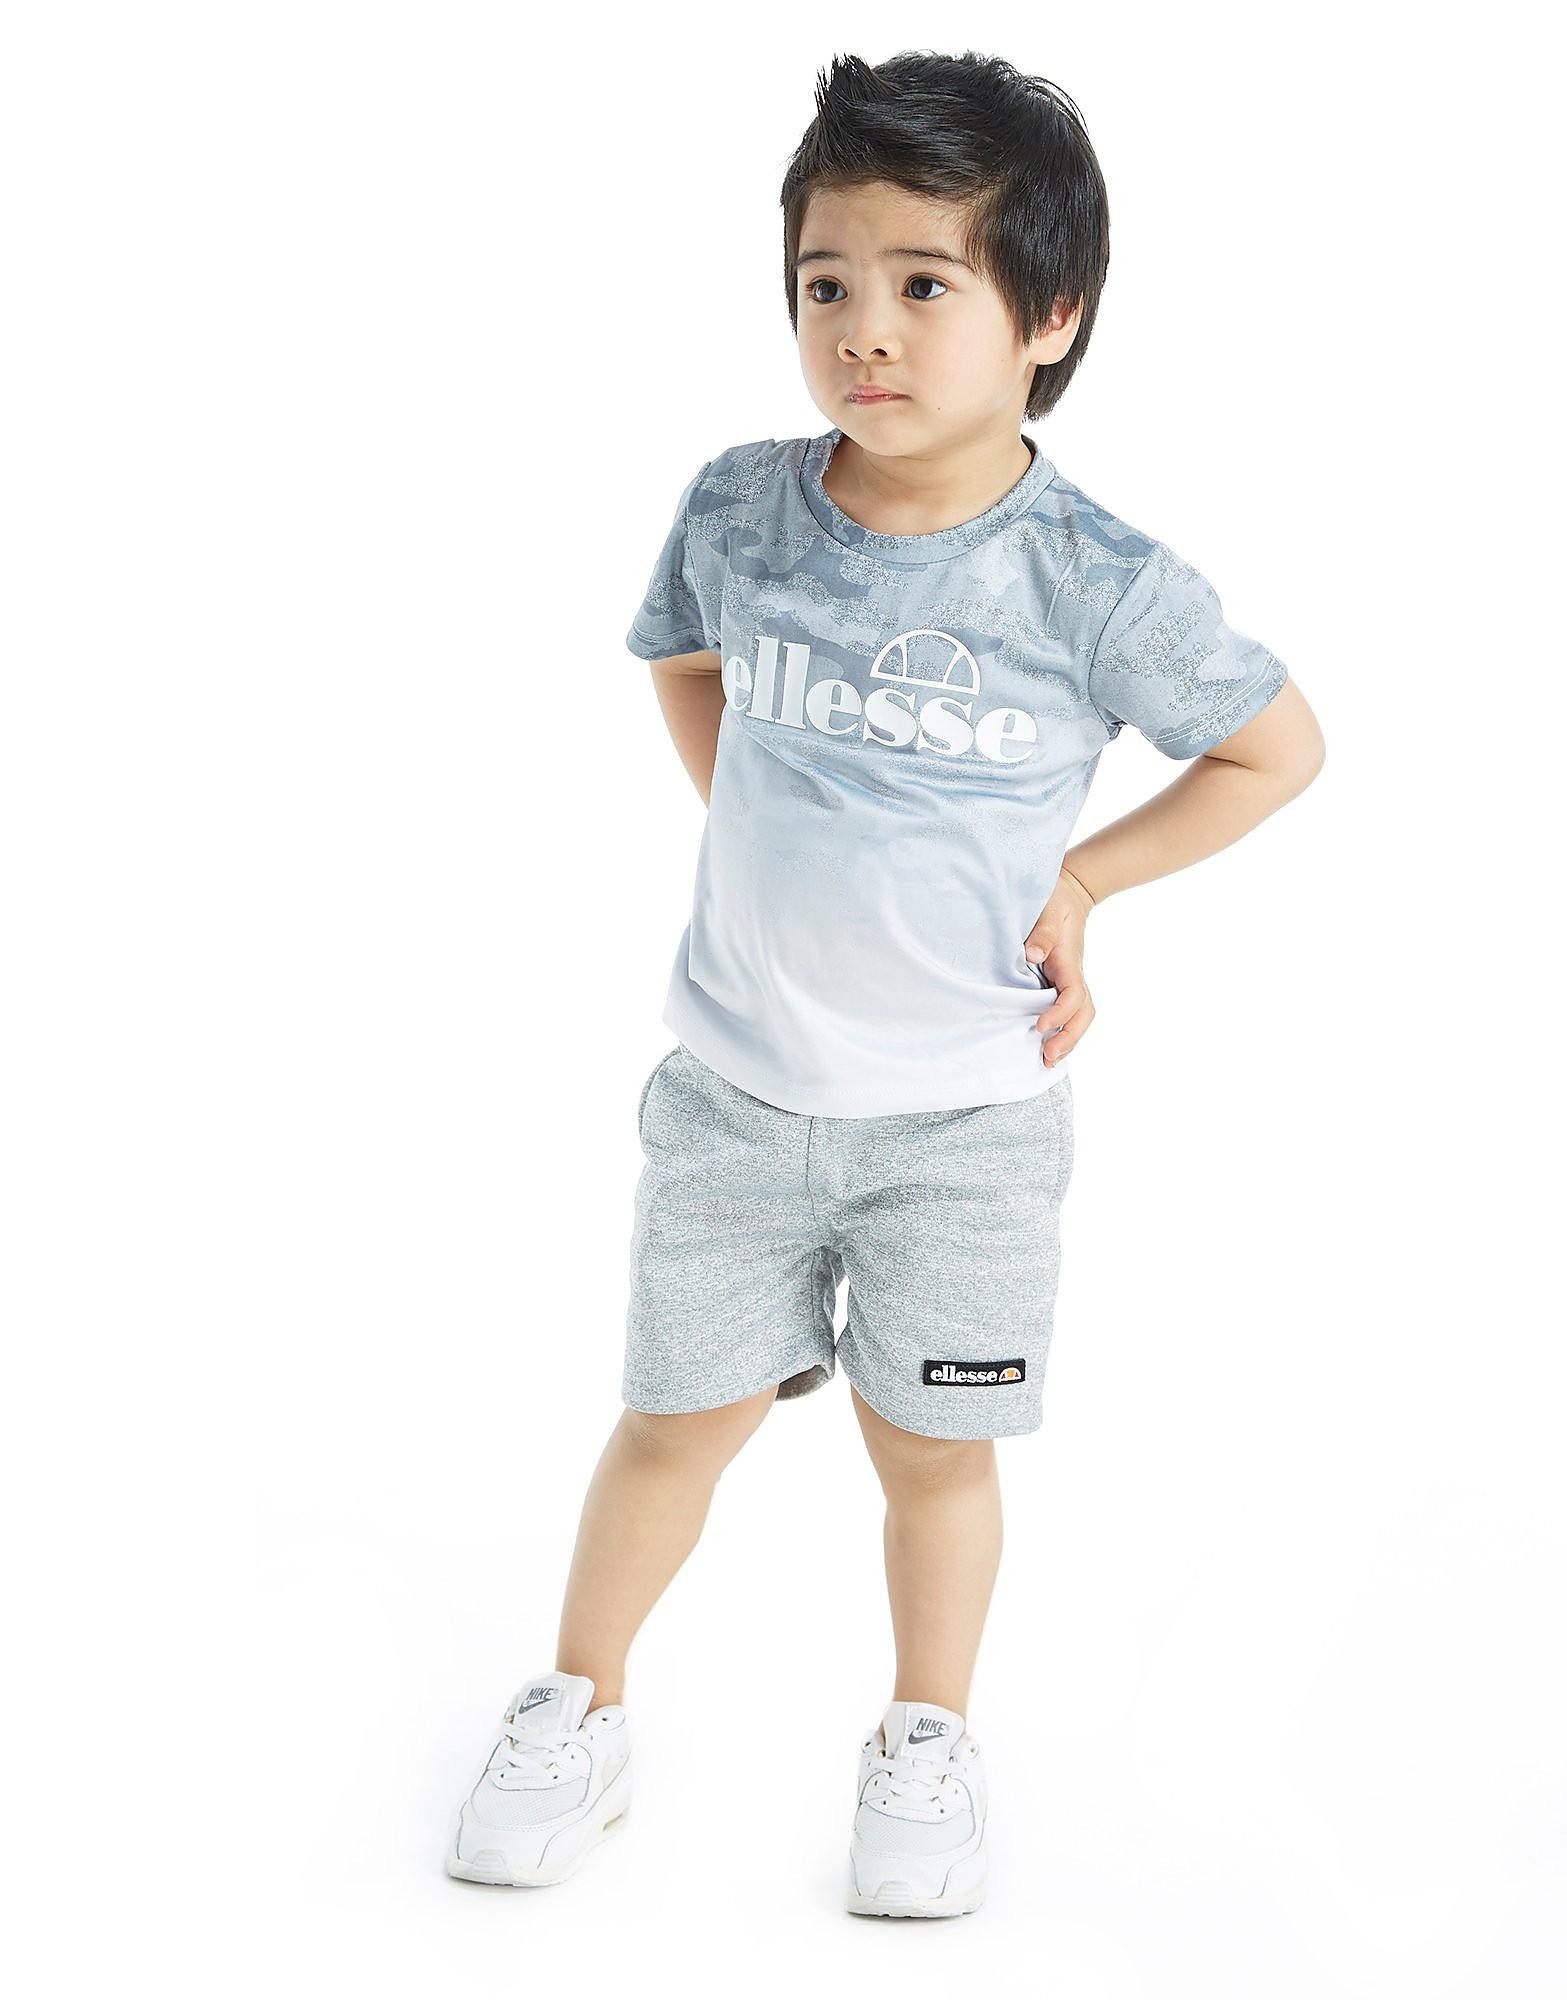 Ellesse Diego Fade T-Shirt & Shorts Set Baby's - Grijs - Kind